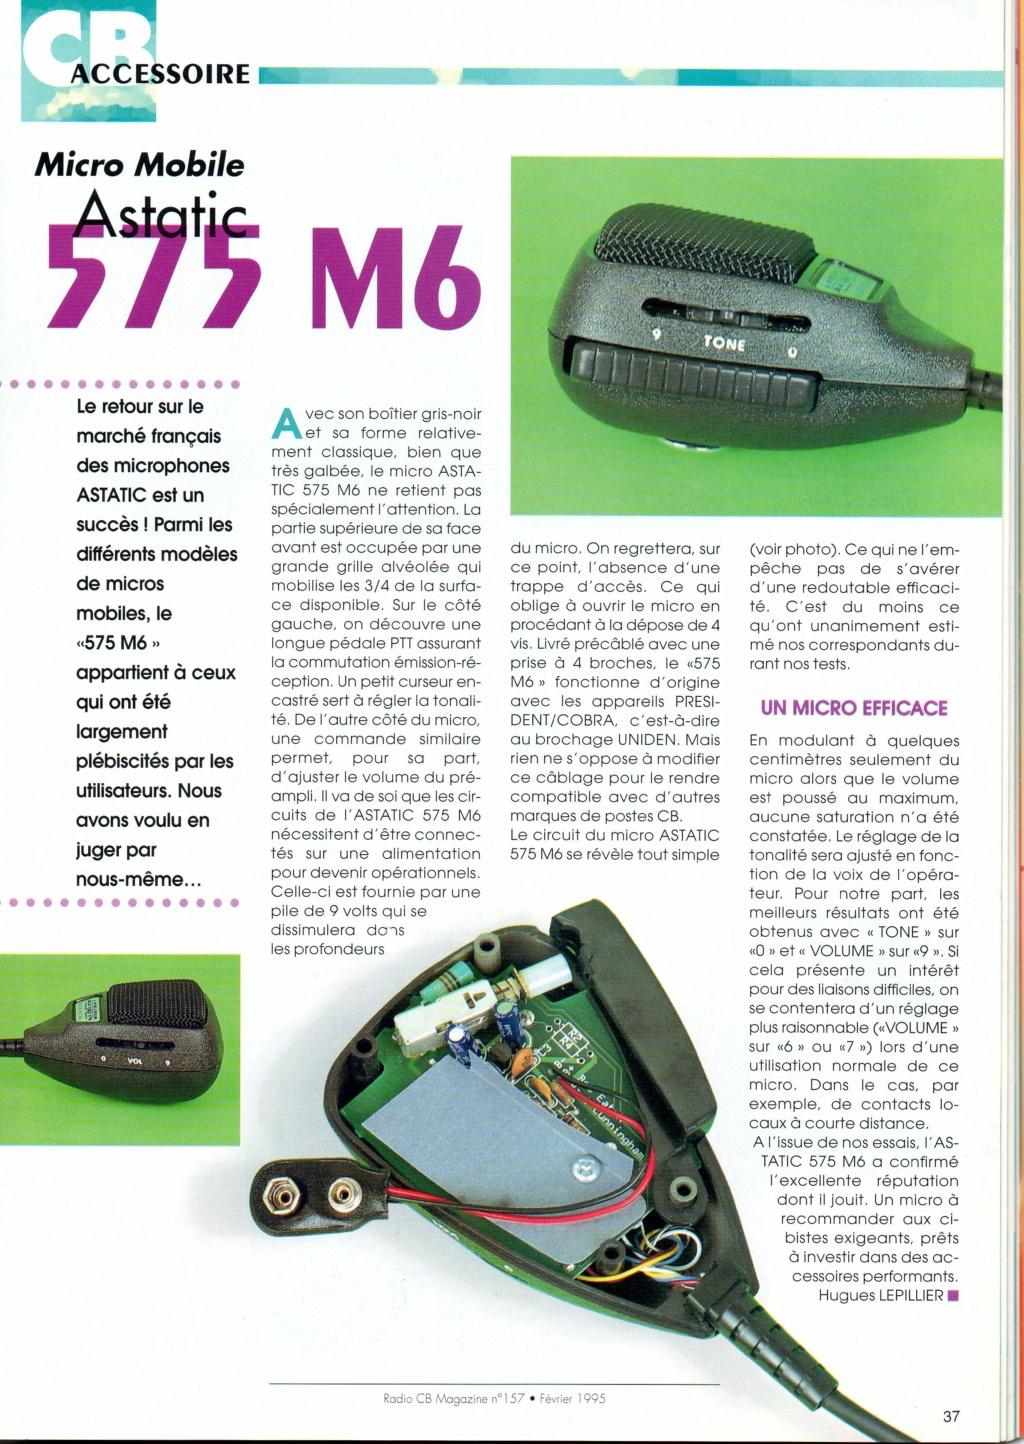 Astatic 575 M6 (Micro mobile) Chora596